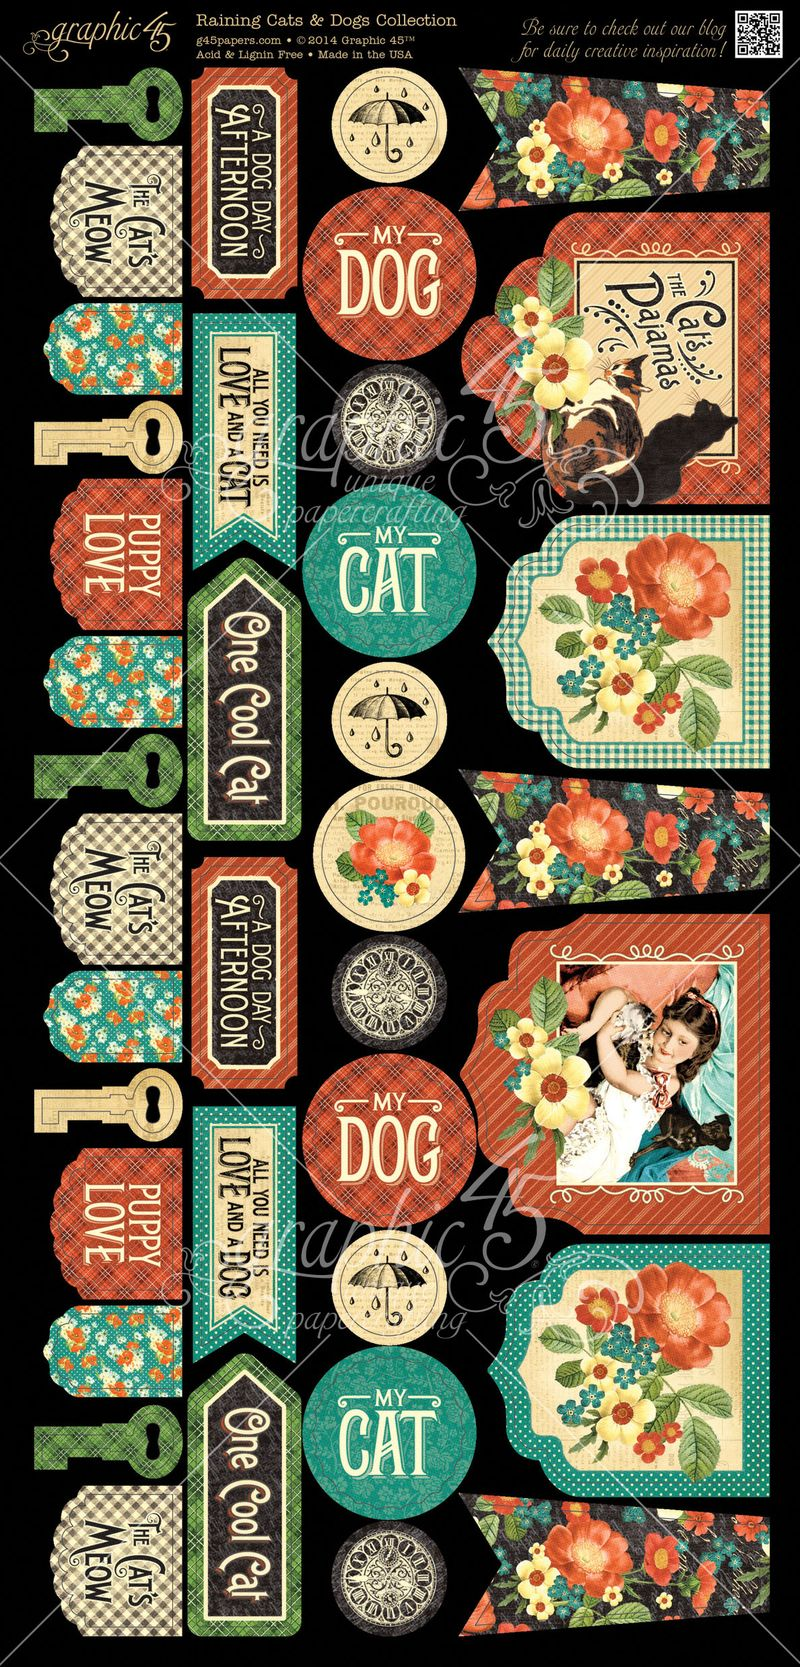 Raining-cats&dogs-banners-2-frt-PR